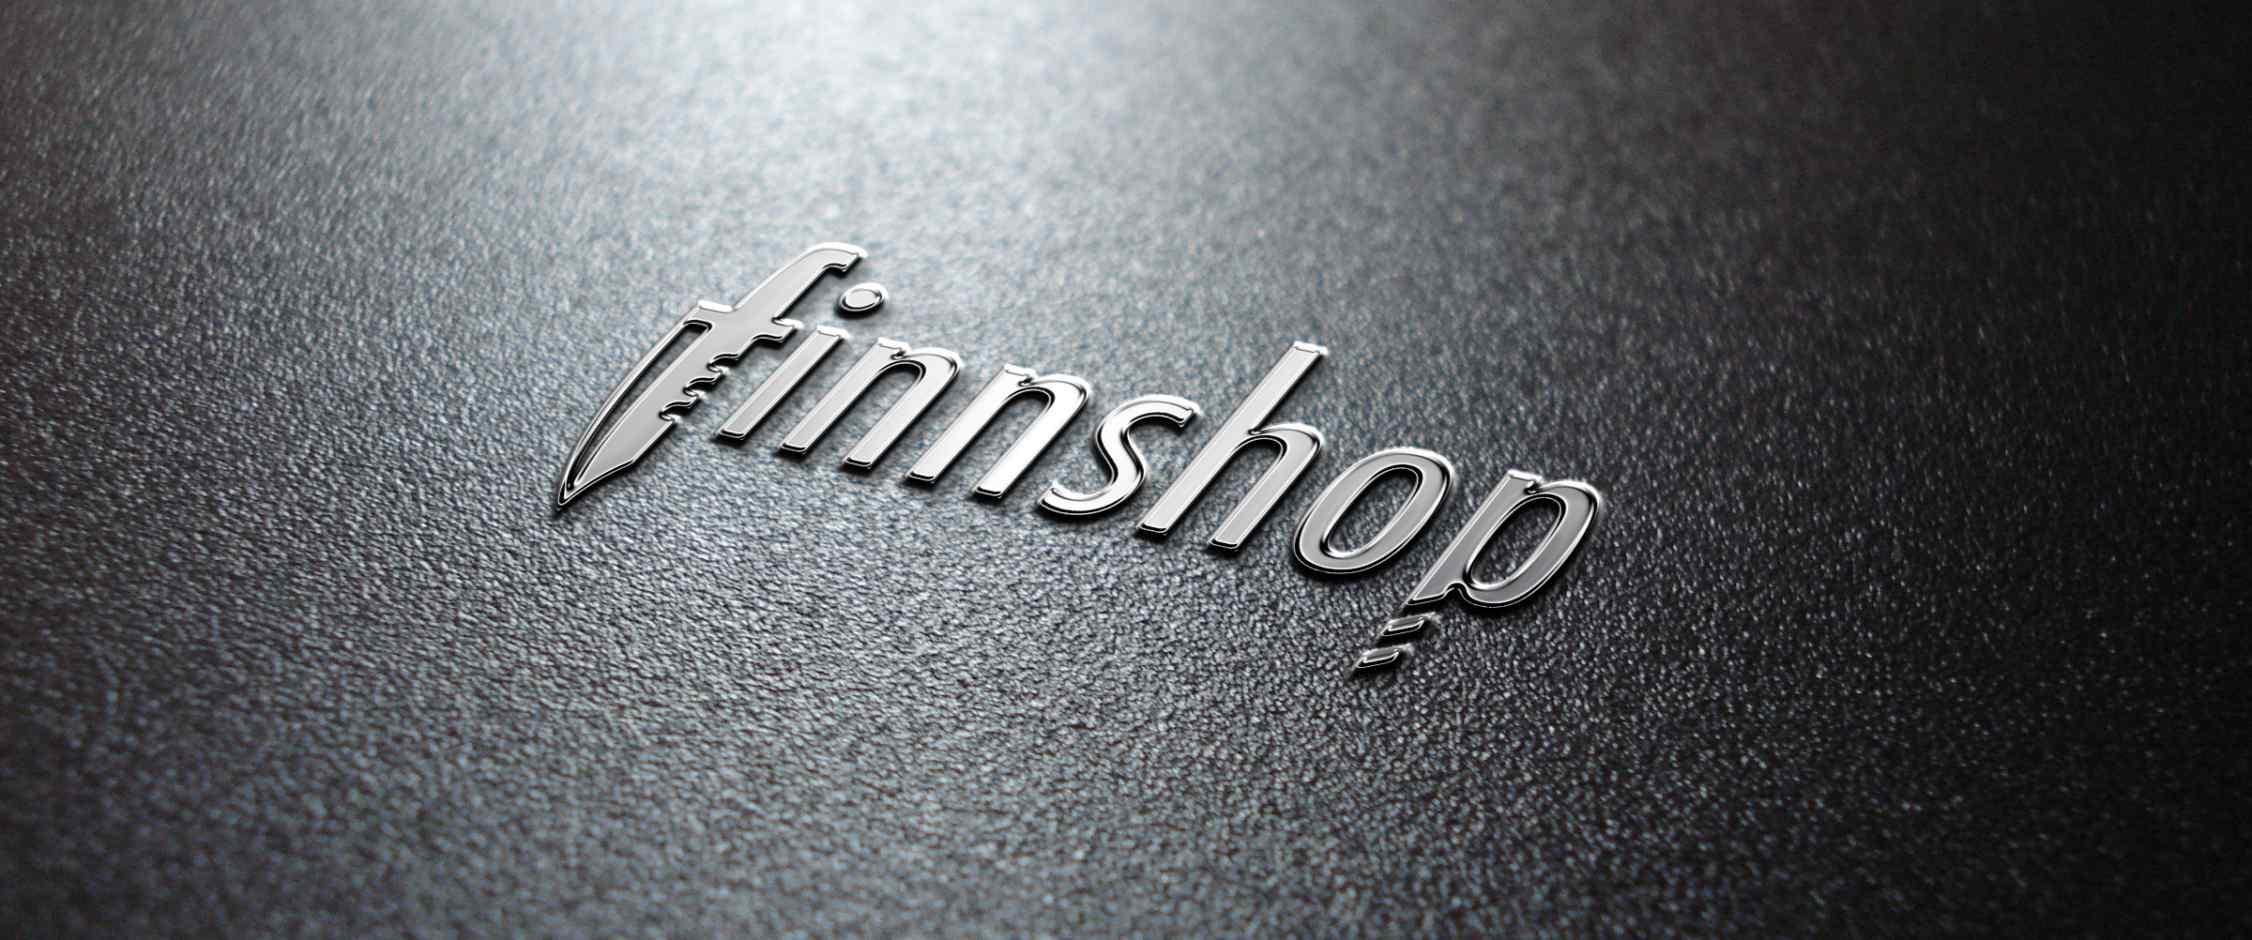 Finnshop logó